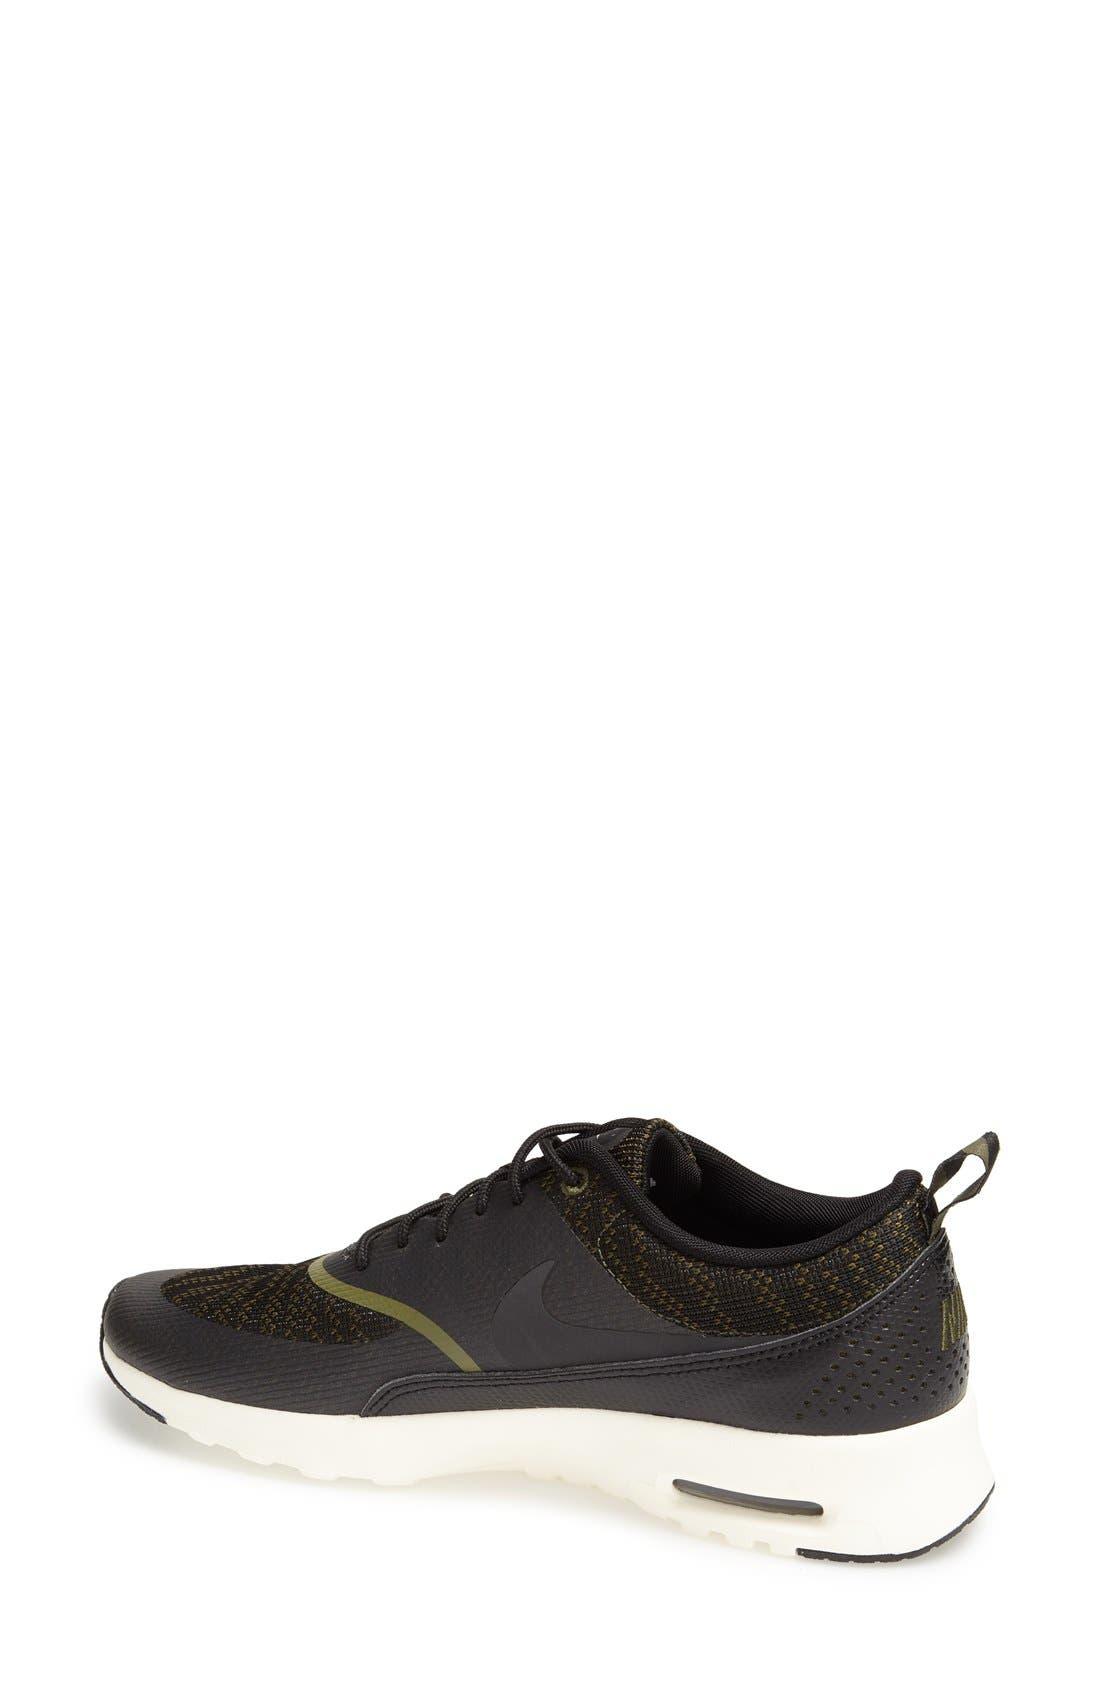 Alternate Image 2  - Nike 'Air Max Thea Jacquard' Sneaker (Women)